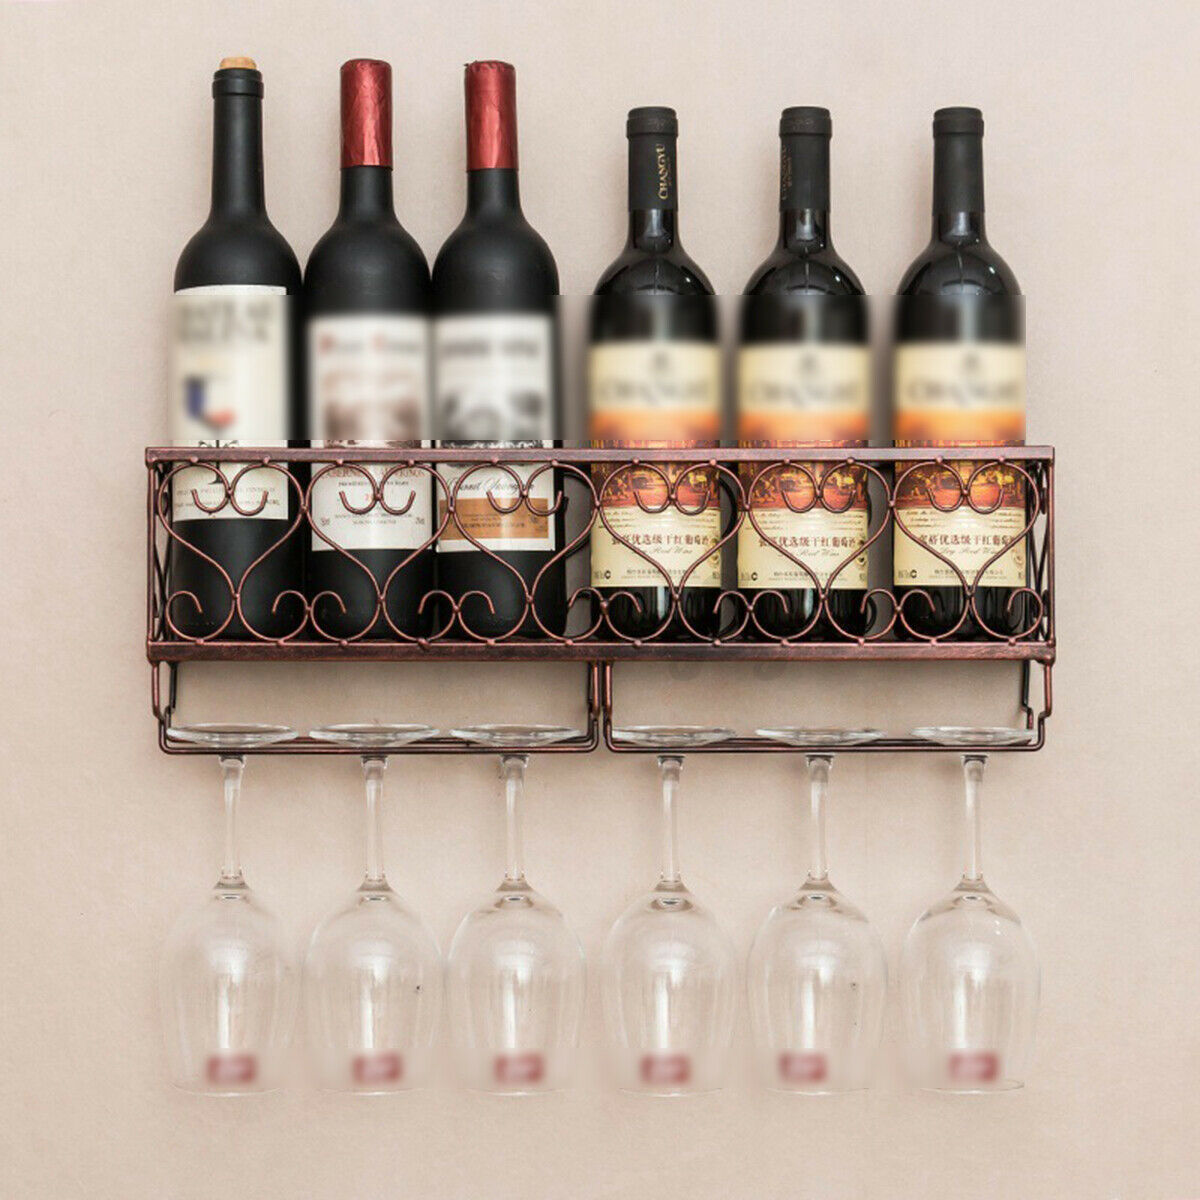 Wildon Home Sutton 7 Bottle Wall Mounted Wine Rack For Sale Online Ebay